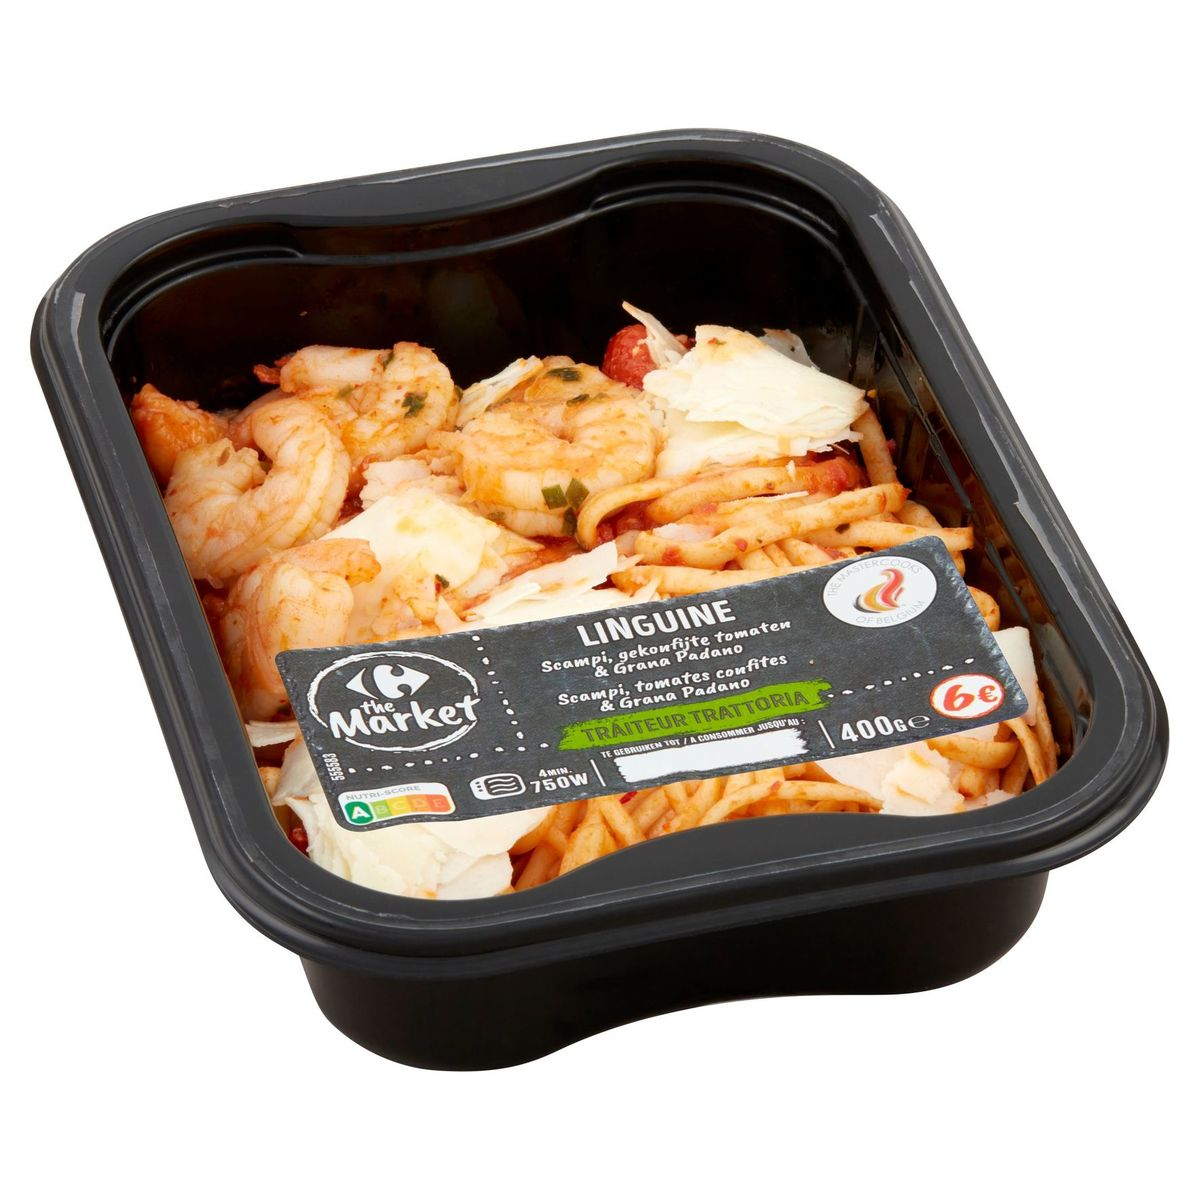 Carrefour Linguine Scampi Tomates Confites & Grana Padano 400 g